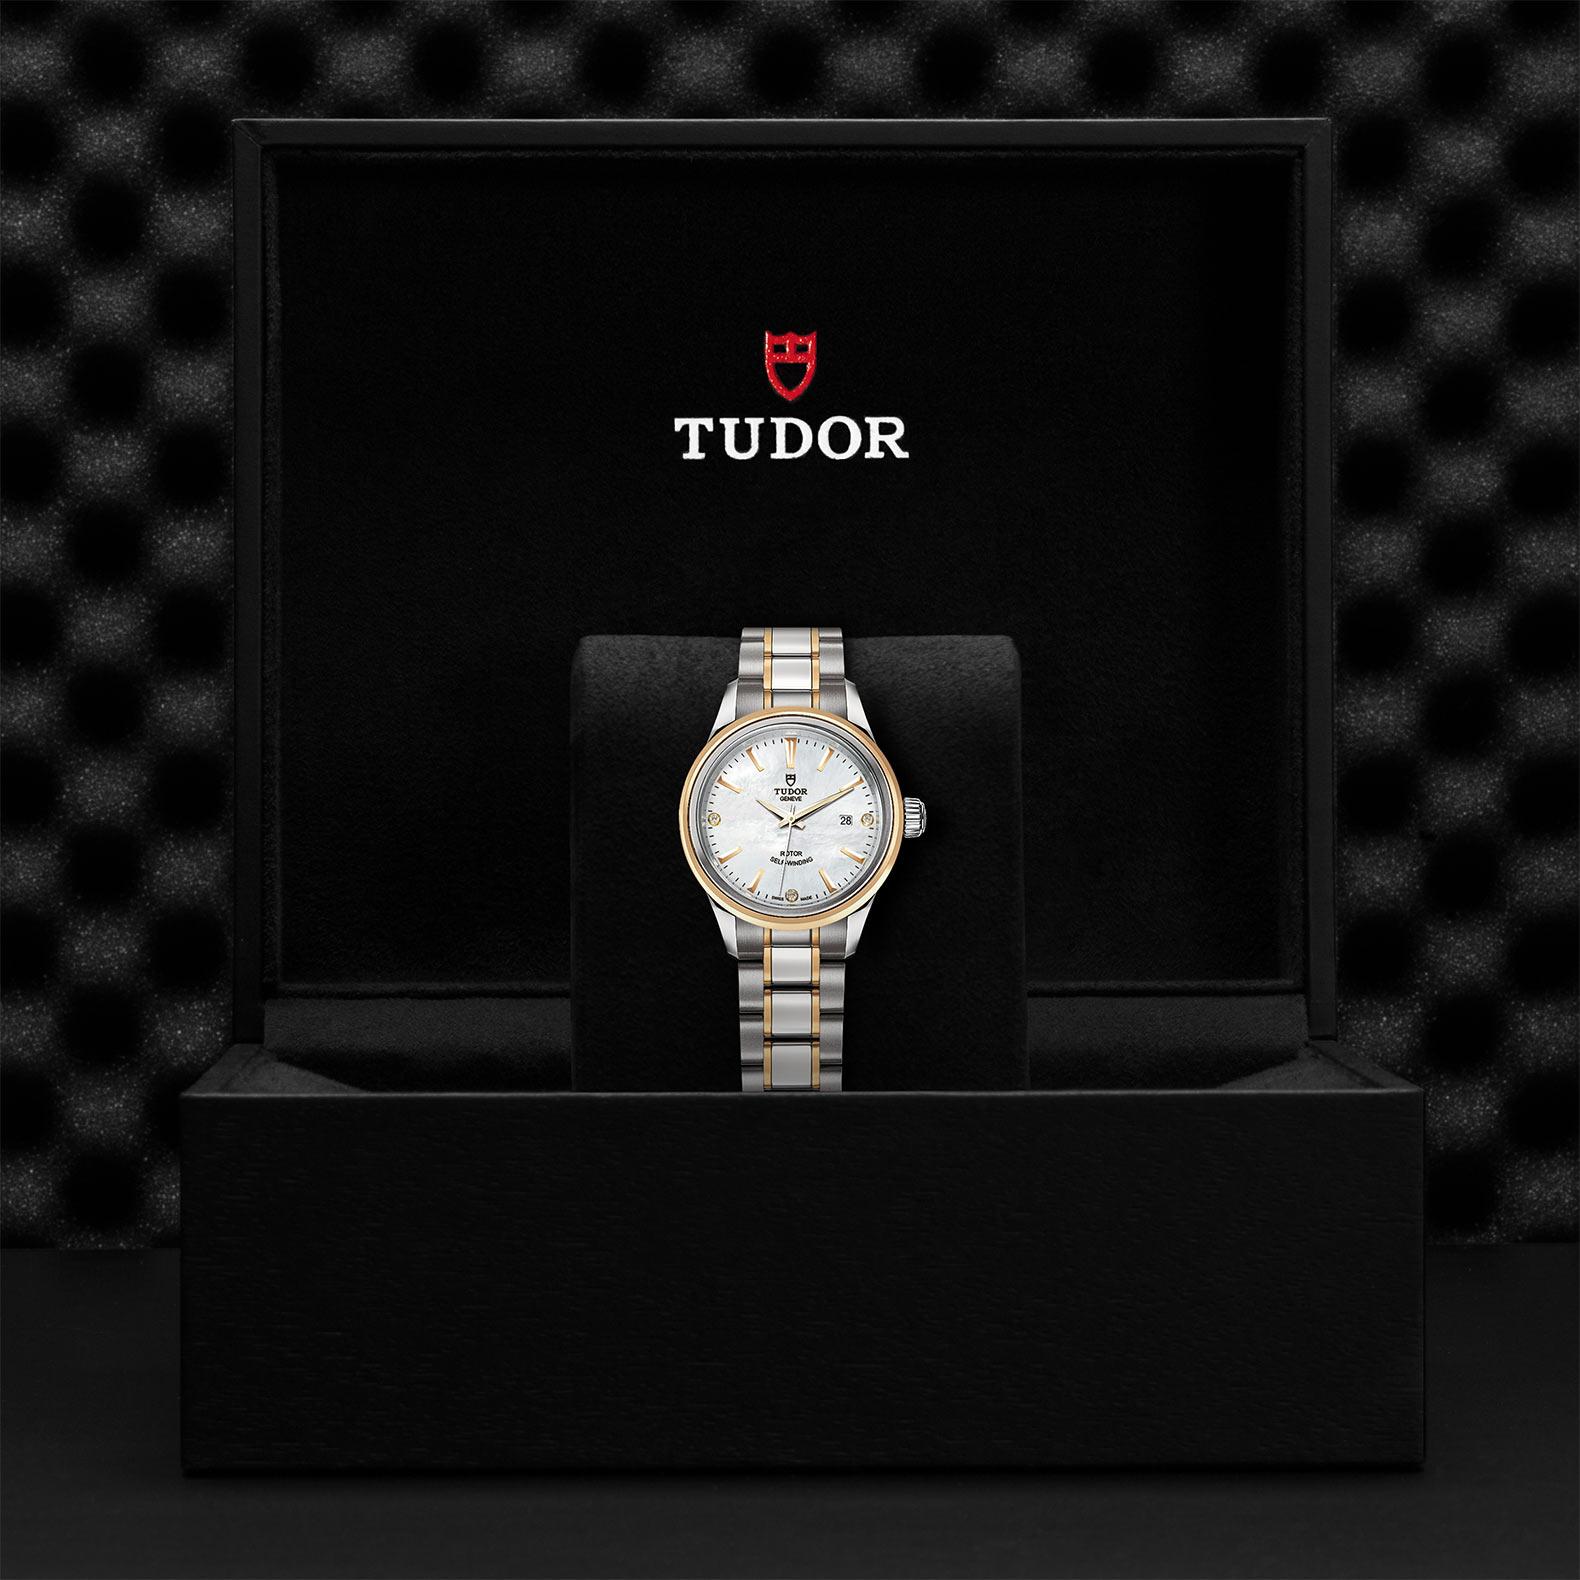 TUDOR Style M12103 0017 Presentationbox